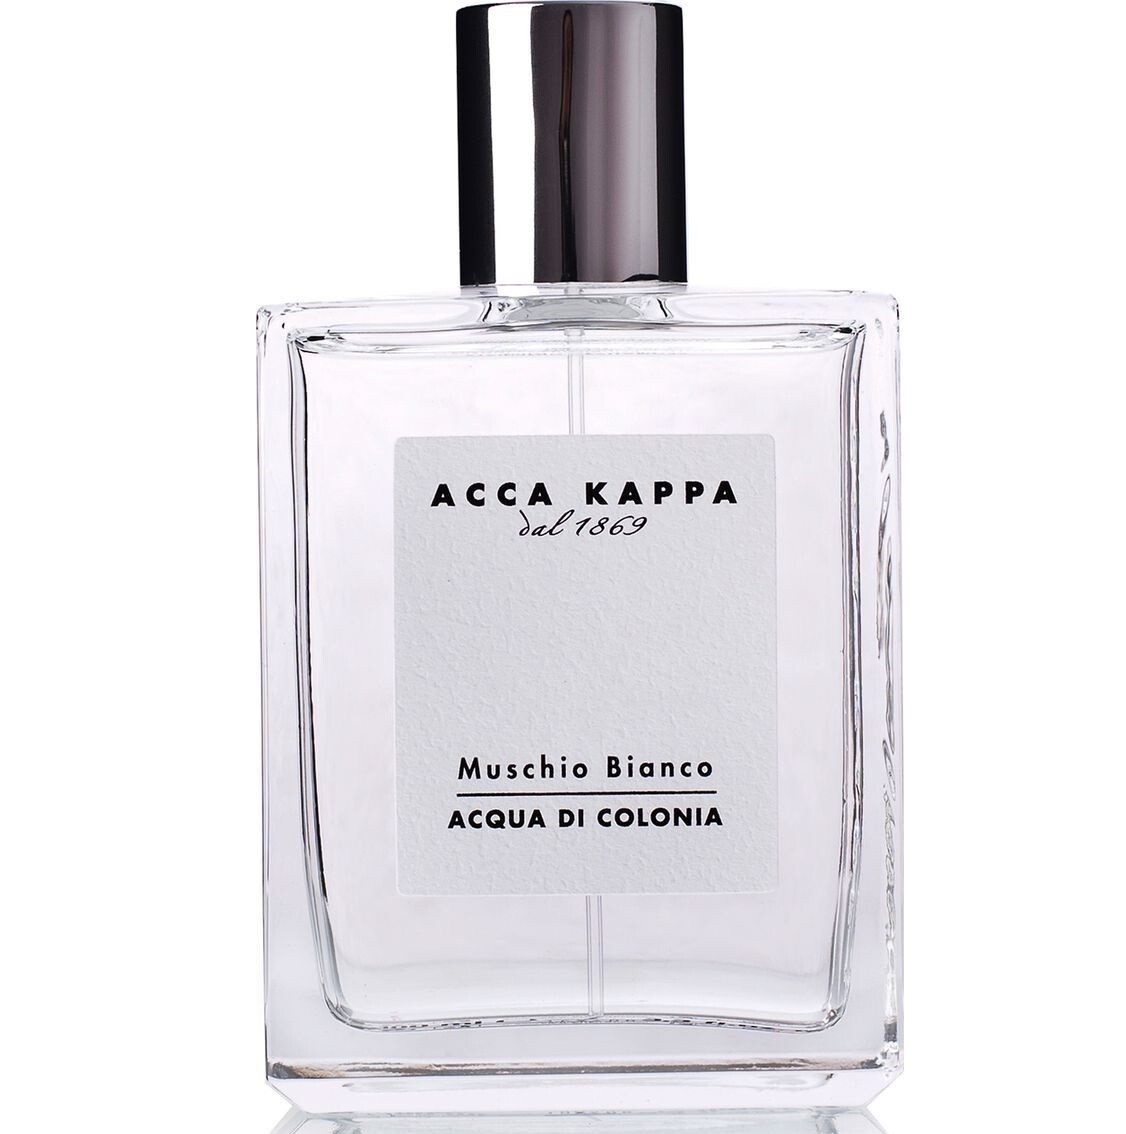 Acca Kappa Muschio Bianco Cologne - Одеколон Белый Мускус 50 мл